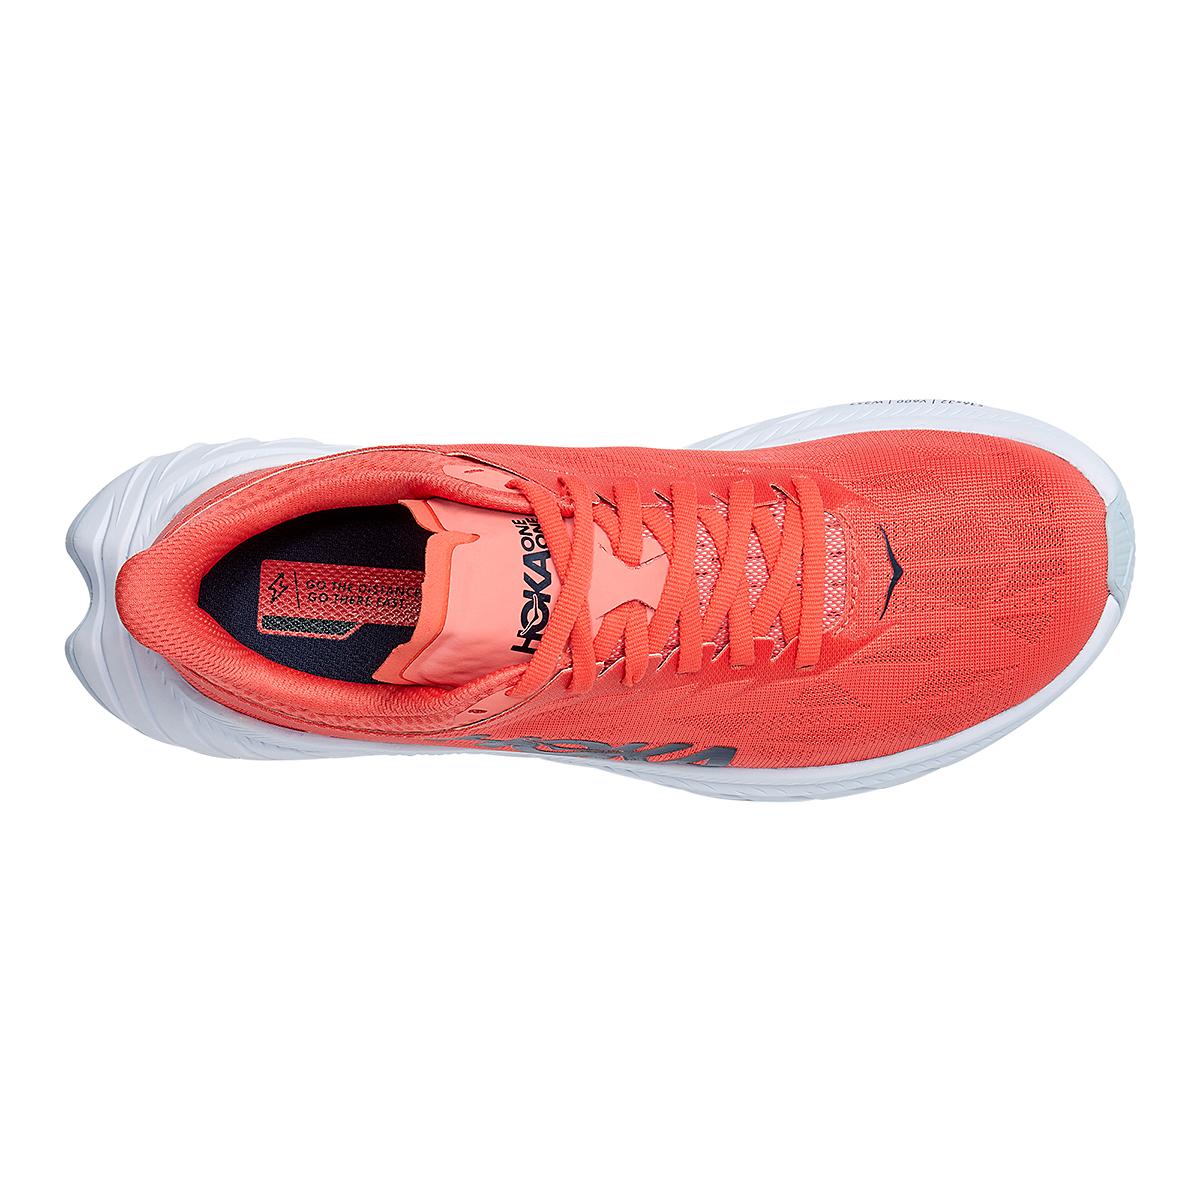 Women's Hoka One One Carbon X 2 Running Shoe - Color: Hot Coral/Black Iris - Size: 5 - Width: Regular, Hot Coral/Black Iris, large, image 5